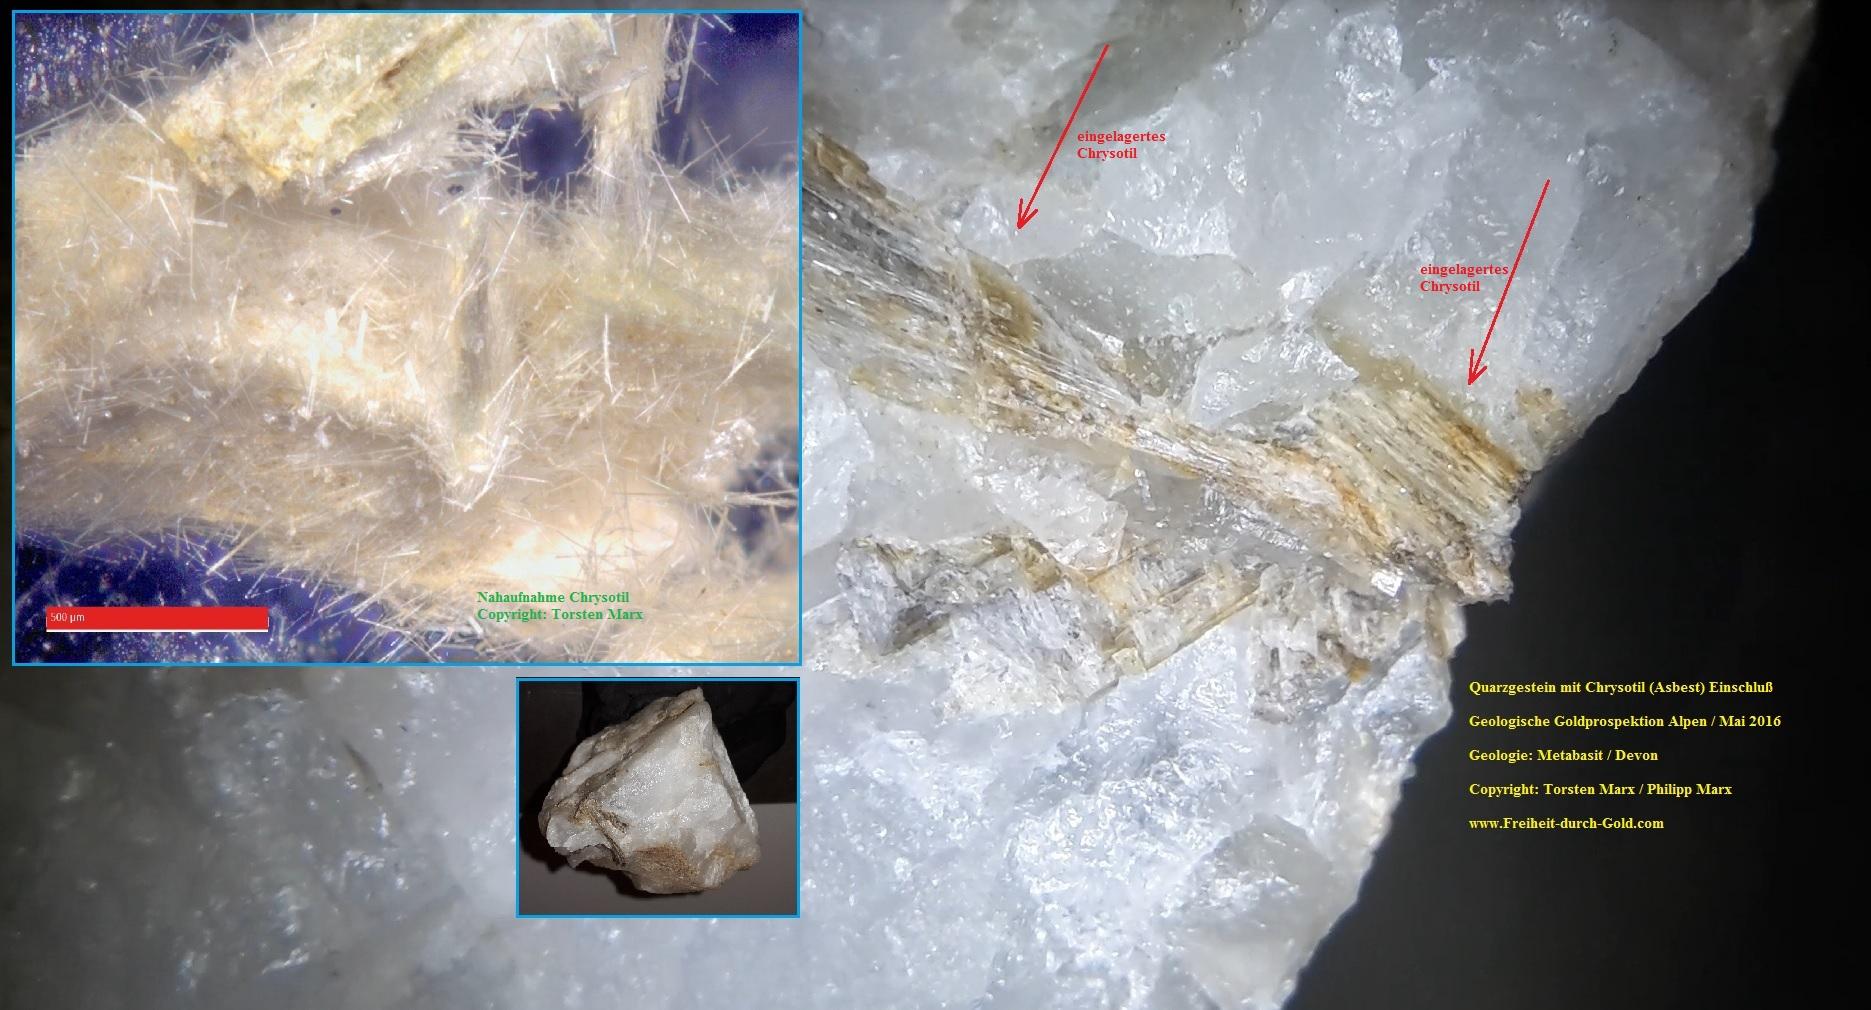 Quarzgestein mit Chrysotil - Torsten Marx